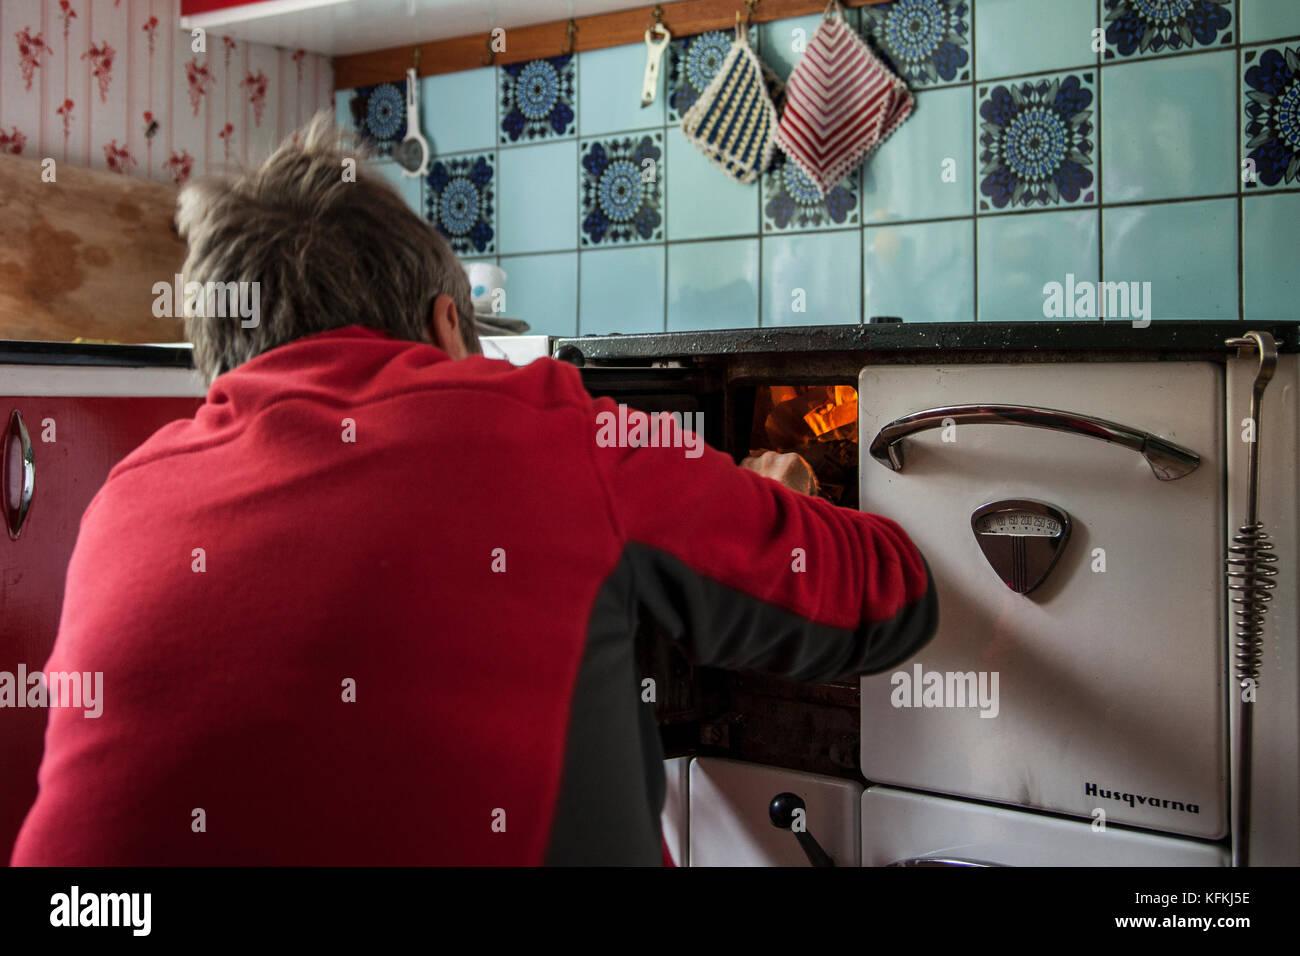 Kvinna tänder vedspisen / Woman lights the wood stove - Stock Image